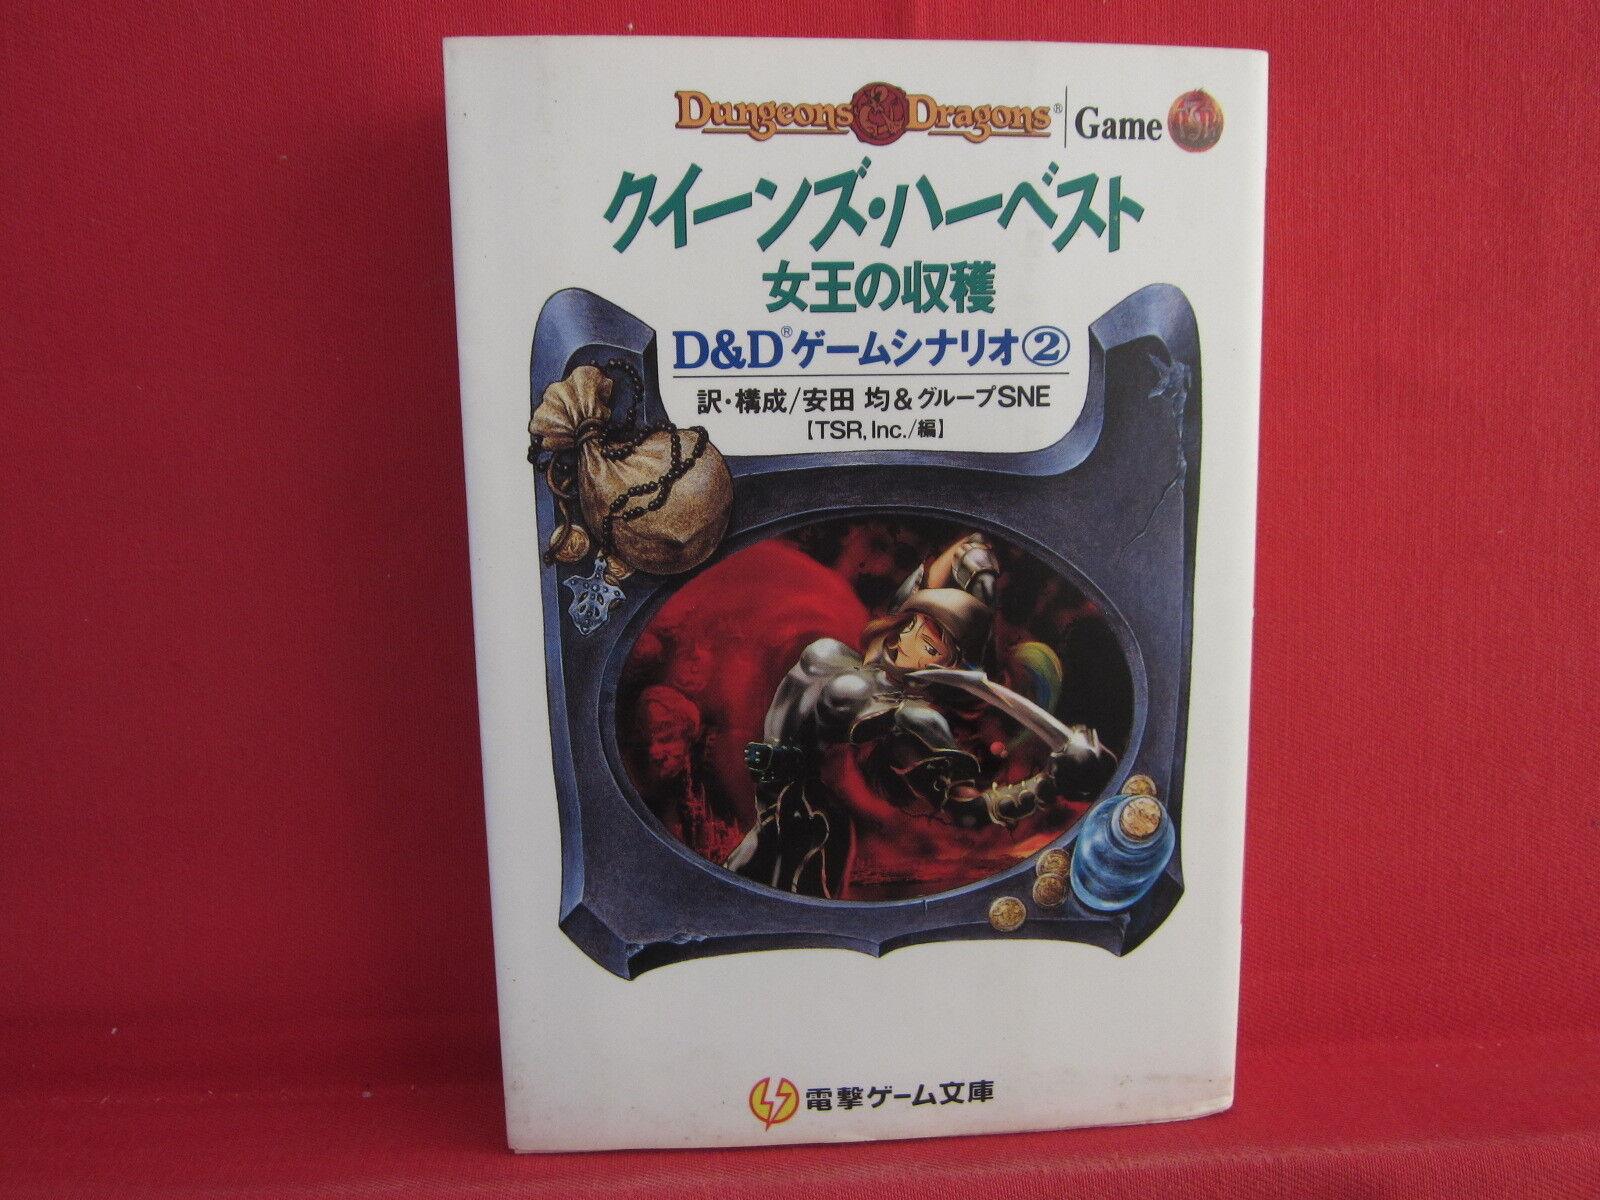 Queen's cosecha Joou no Shukaku d&d escenario de juego libro juego granada de cohete propulsado